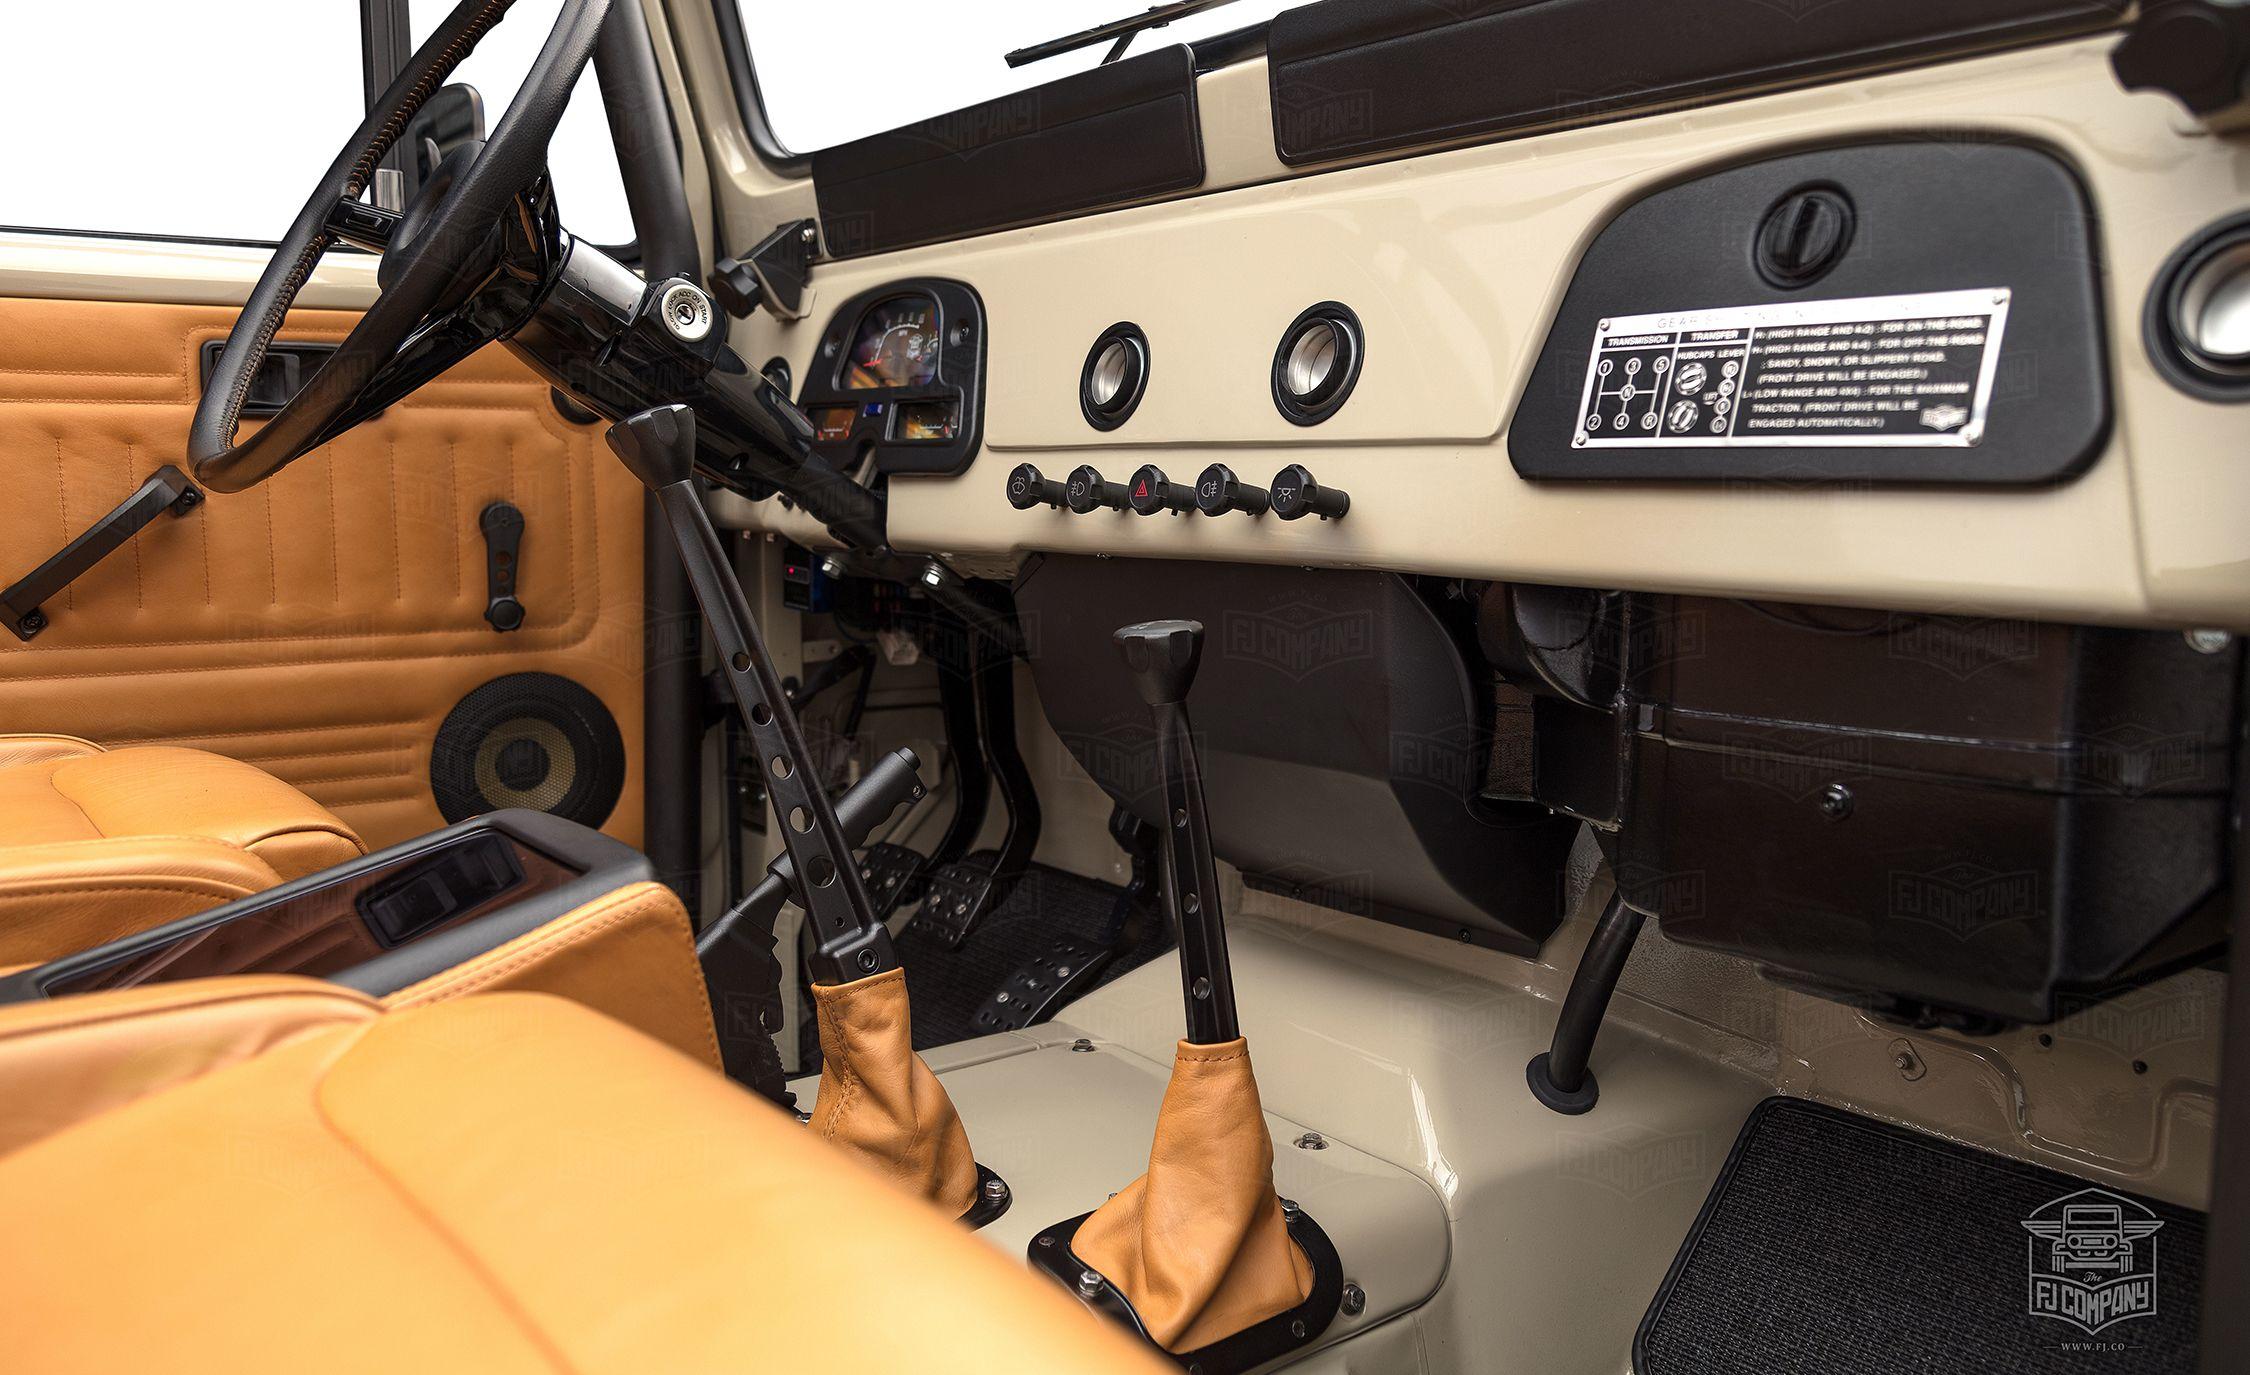 How The Fj Company Turns A Vintage Toyota Land Cruiser Into A 200k